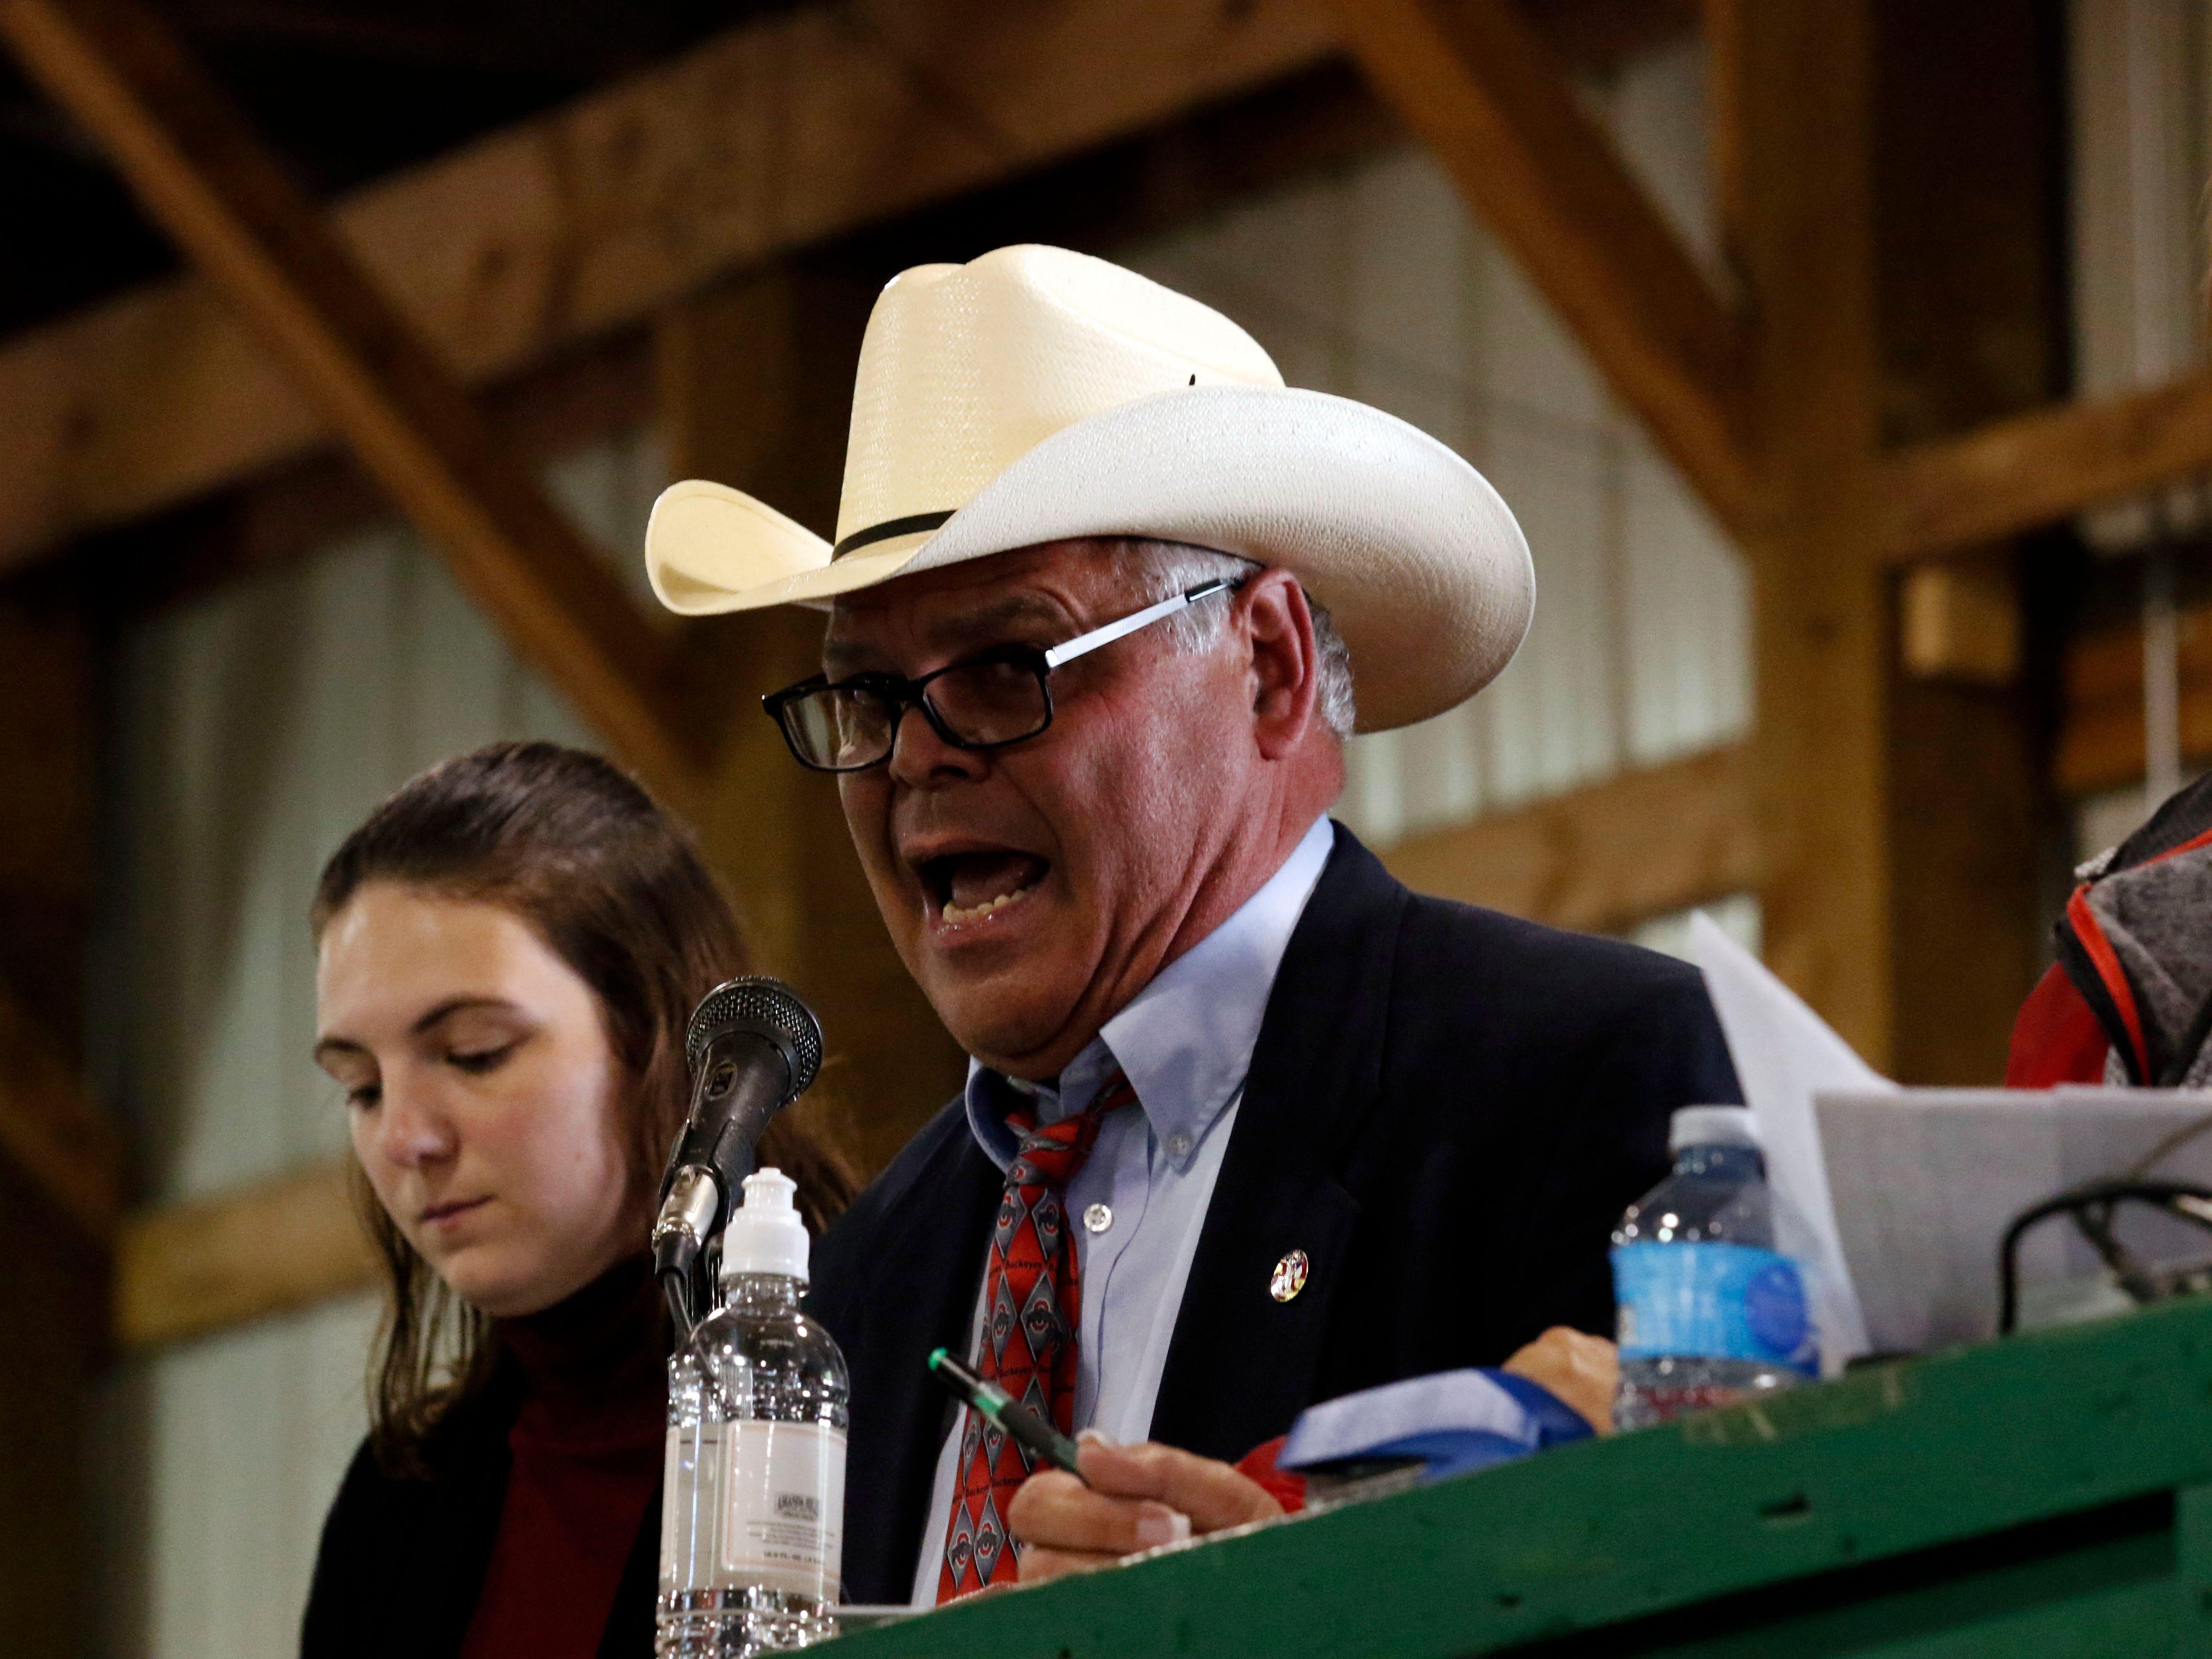 The junior fair livestock auction began Thursday evening, Oct. 11, 2018, at the Fairfield County Fair in Lancaster.